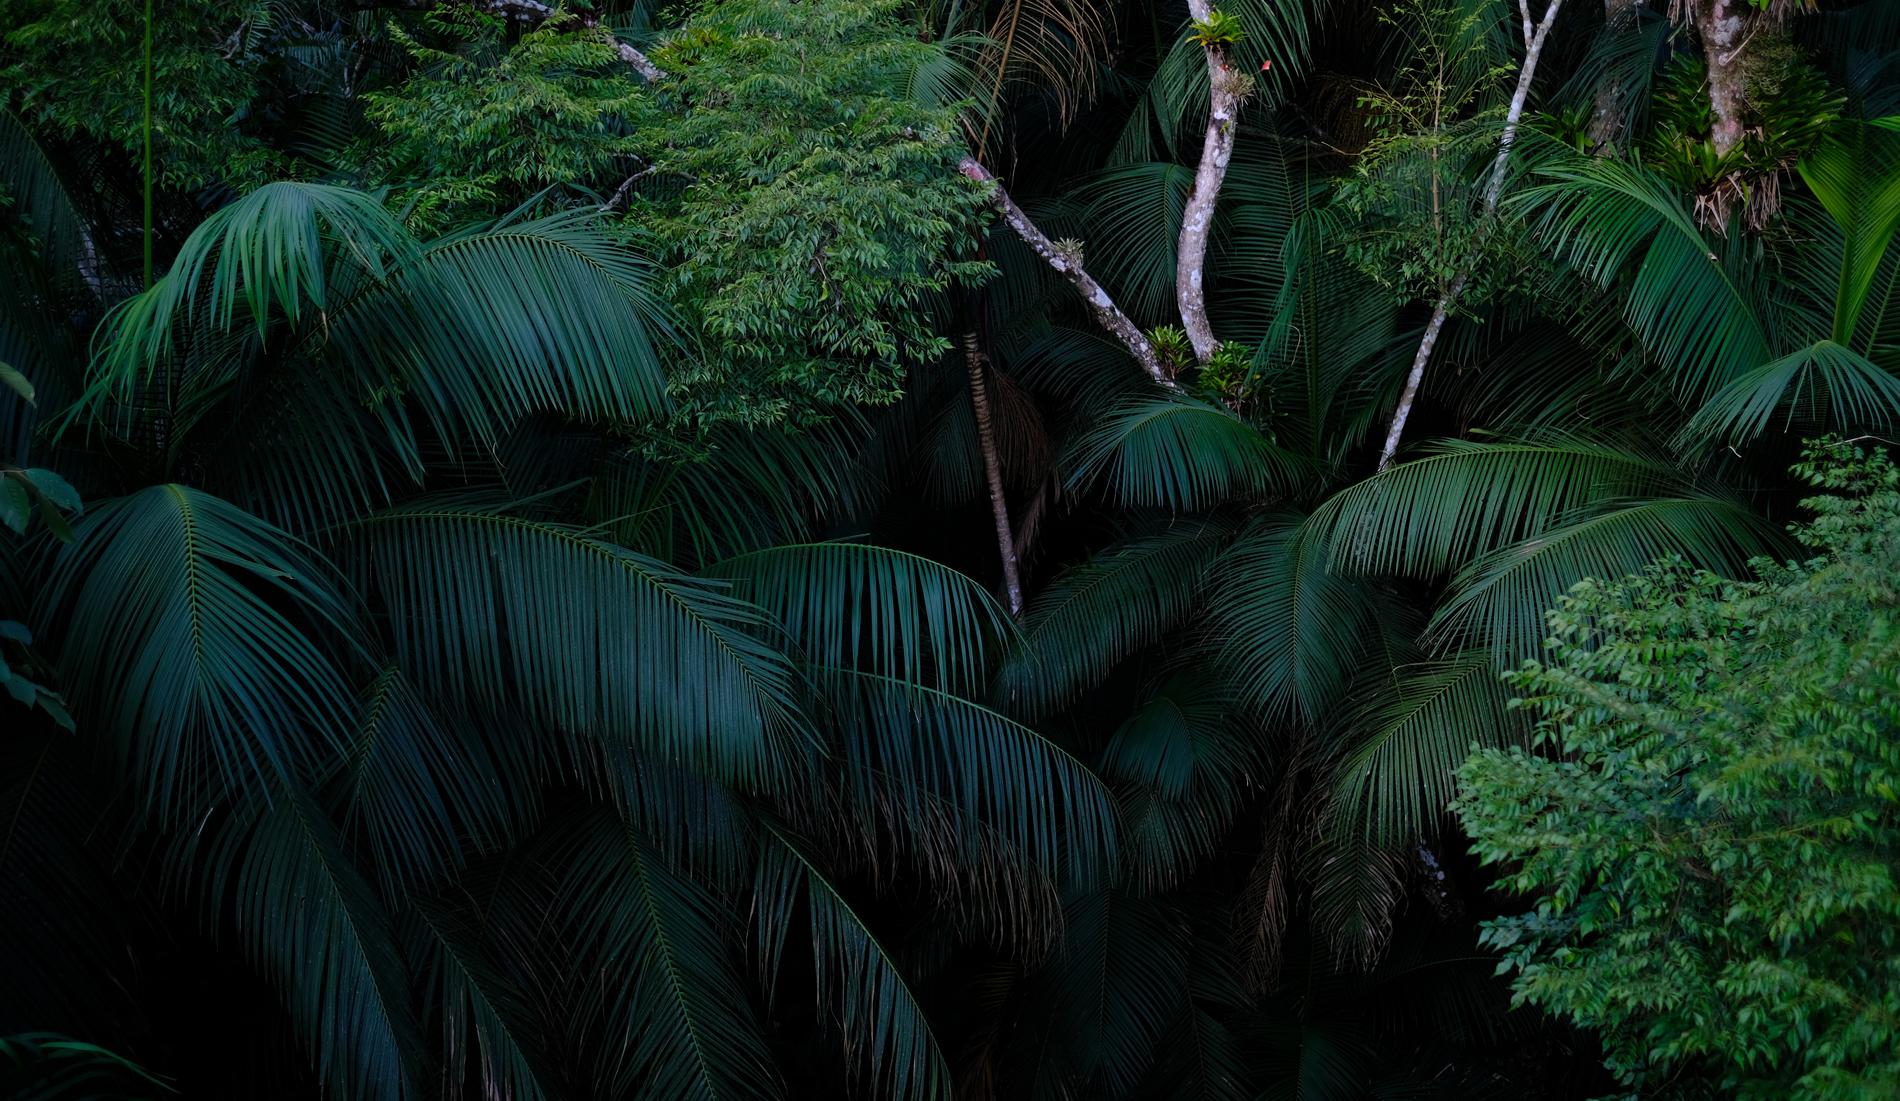 Palmeira Jucára